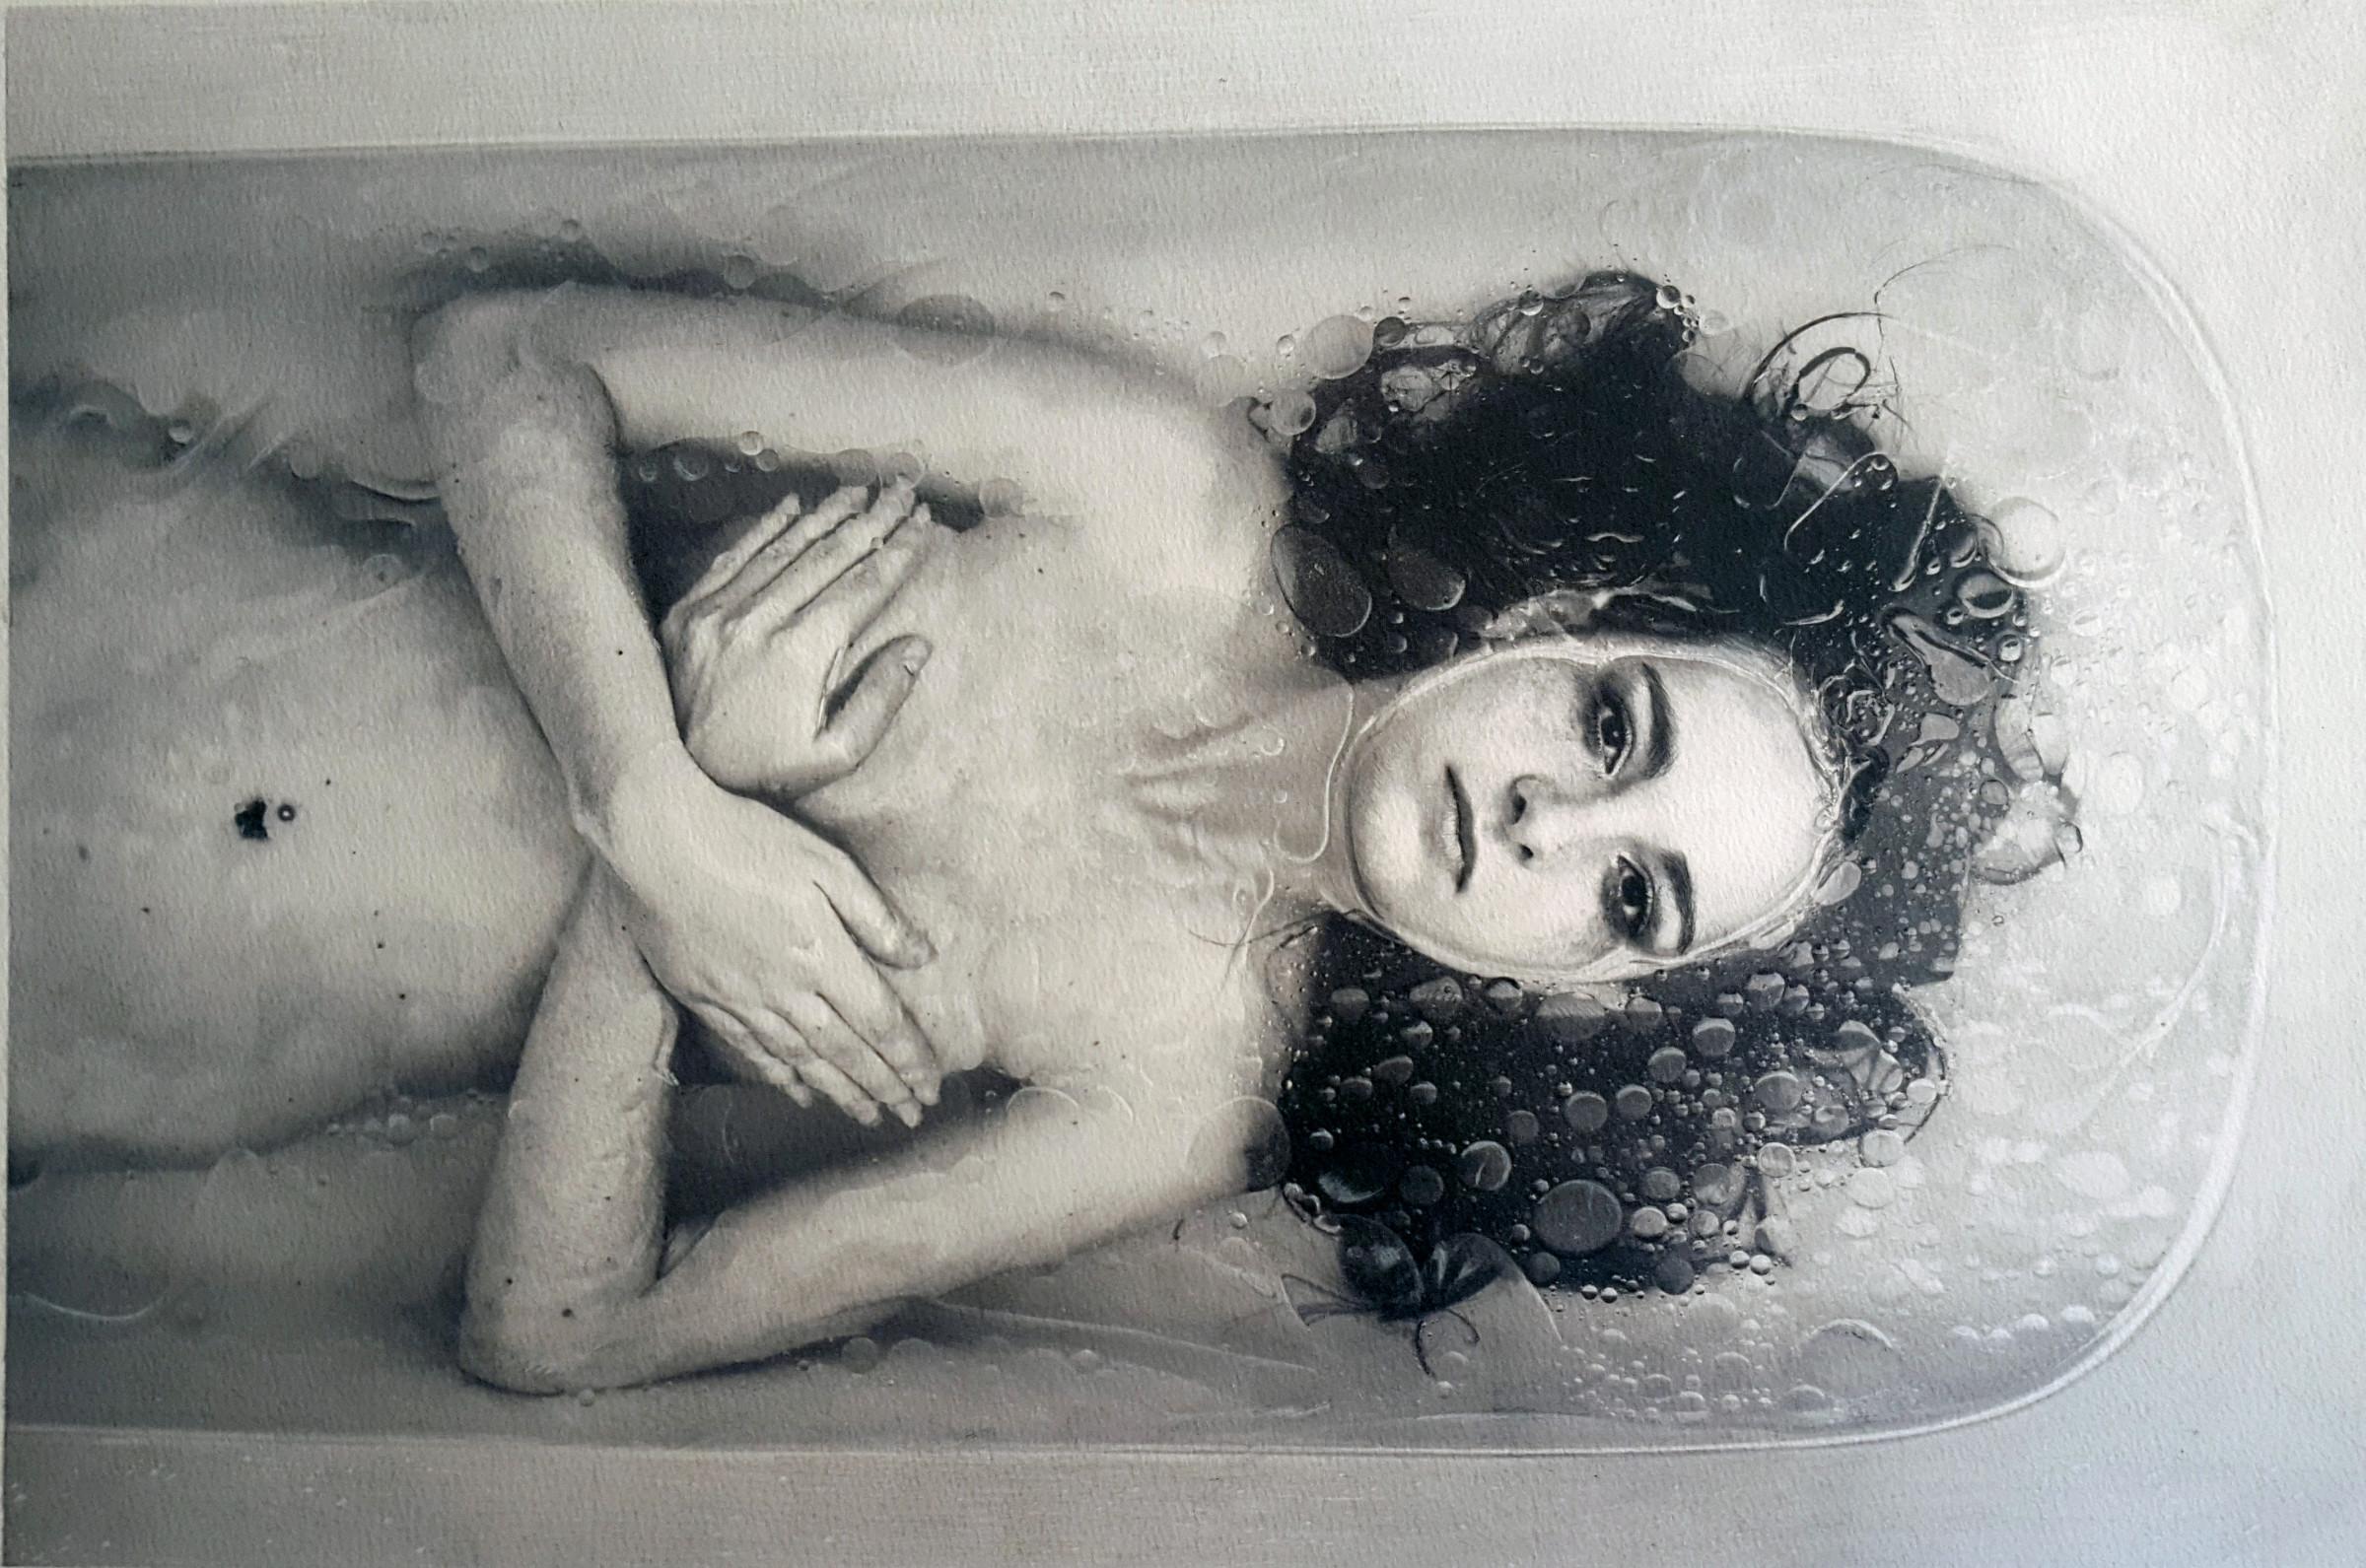 <span class=&#34;link fancybox-details-link&#34;><a href=&#34;/artists/77-paul-cadden/works/2706/&#34;>View Detail Page</a></span><div class=&#34;artist&#34;><strong>Paul Cadden</strong></div> <div class=&#34;title&#34;><em>Song for the Siren</em></div> <div class=&#34;medium&#34;>Pencil on paper</div> <div class=&#34;dimensions&#34;>36 x 54 cm </div><div class=&#34;copyright_line&#34;>Copyright The Artist</div>